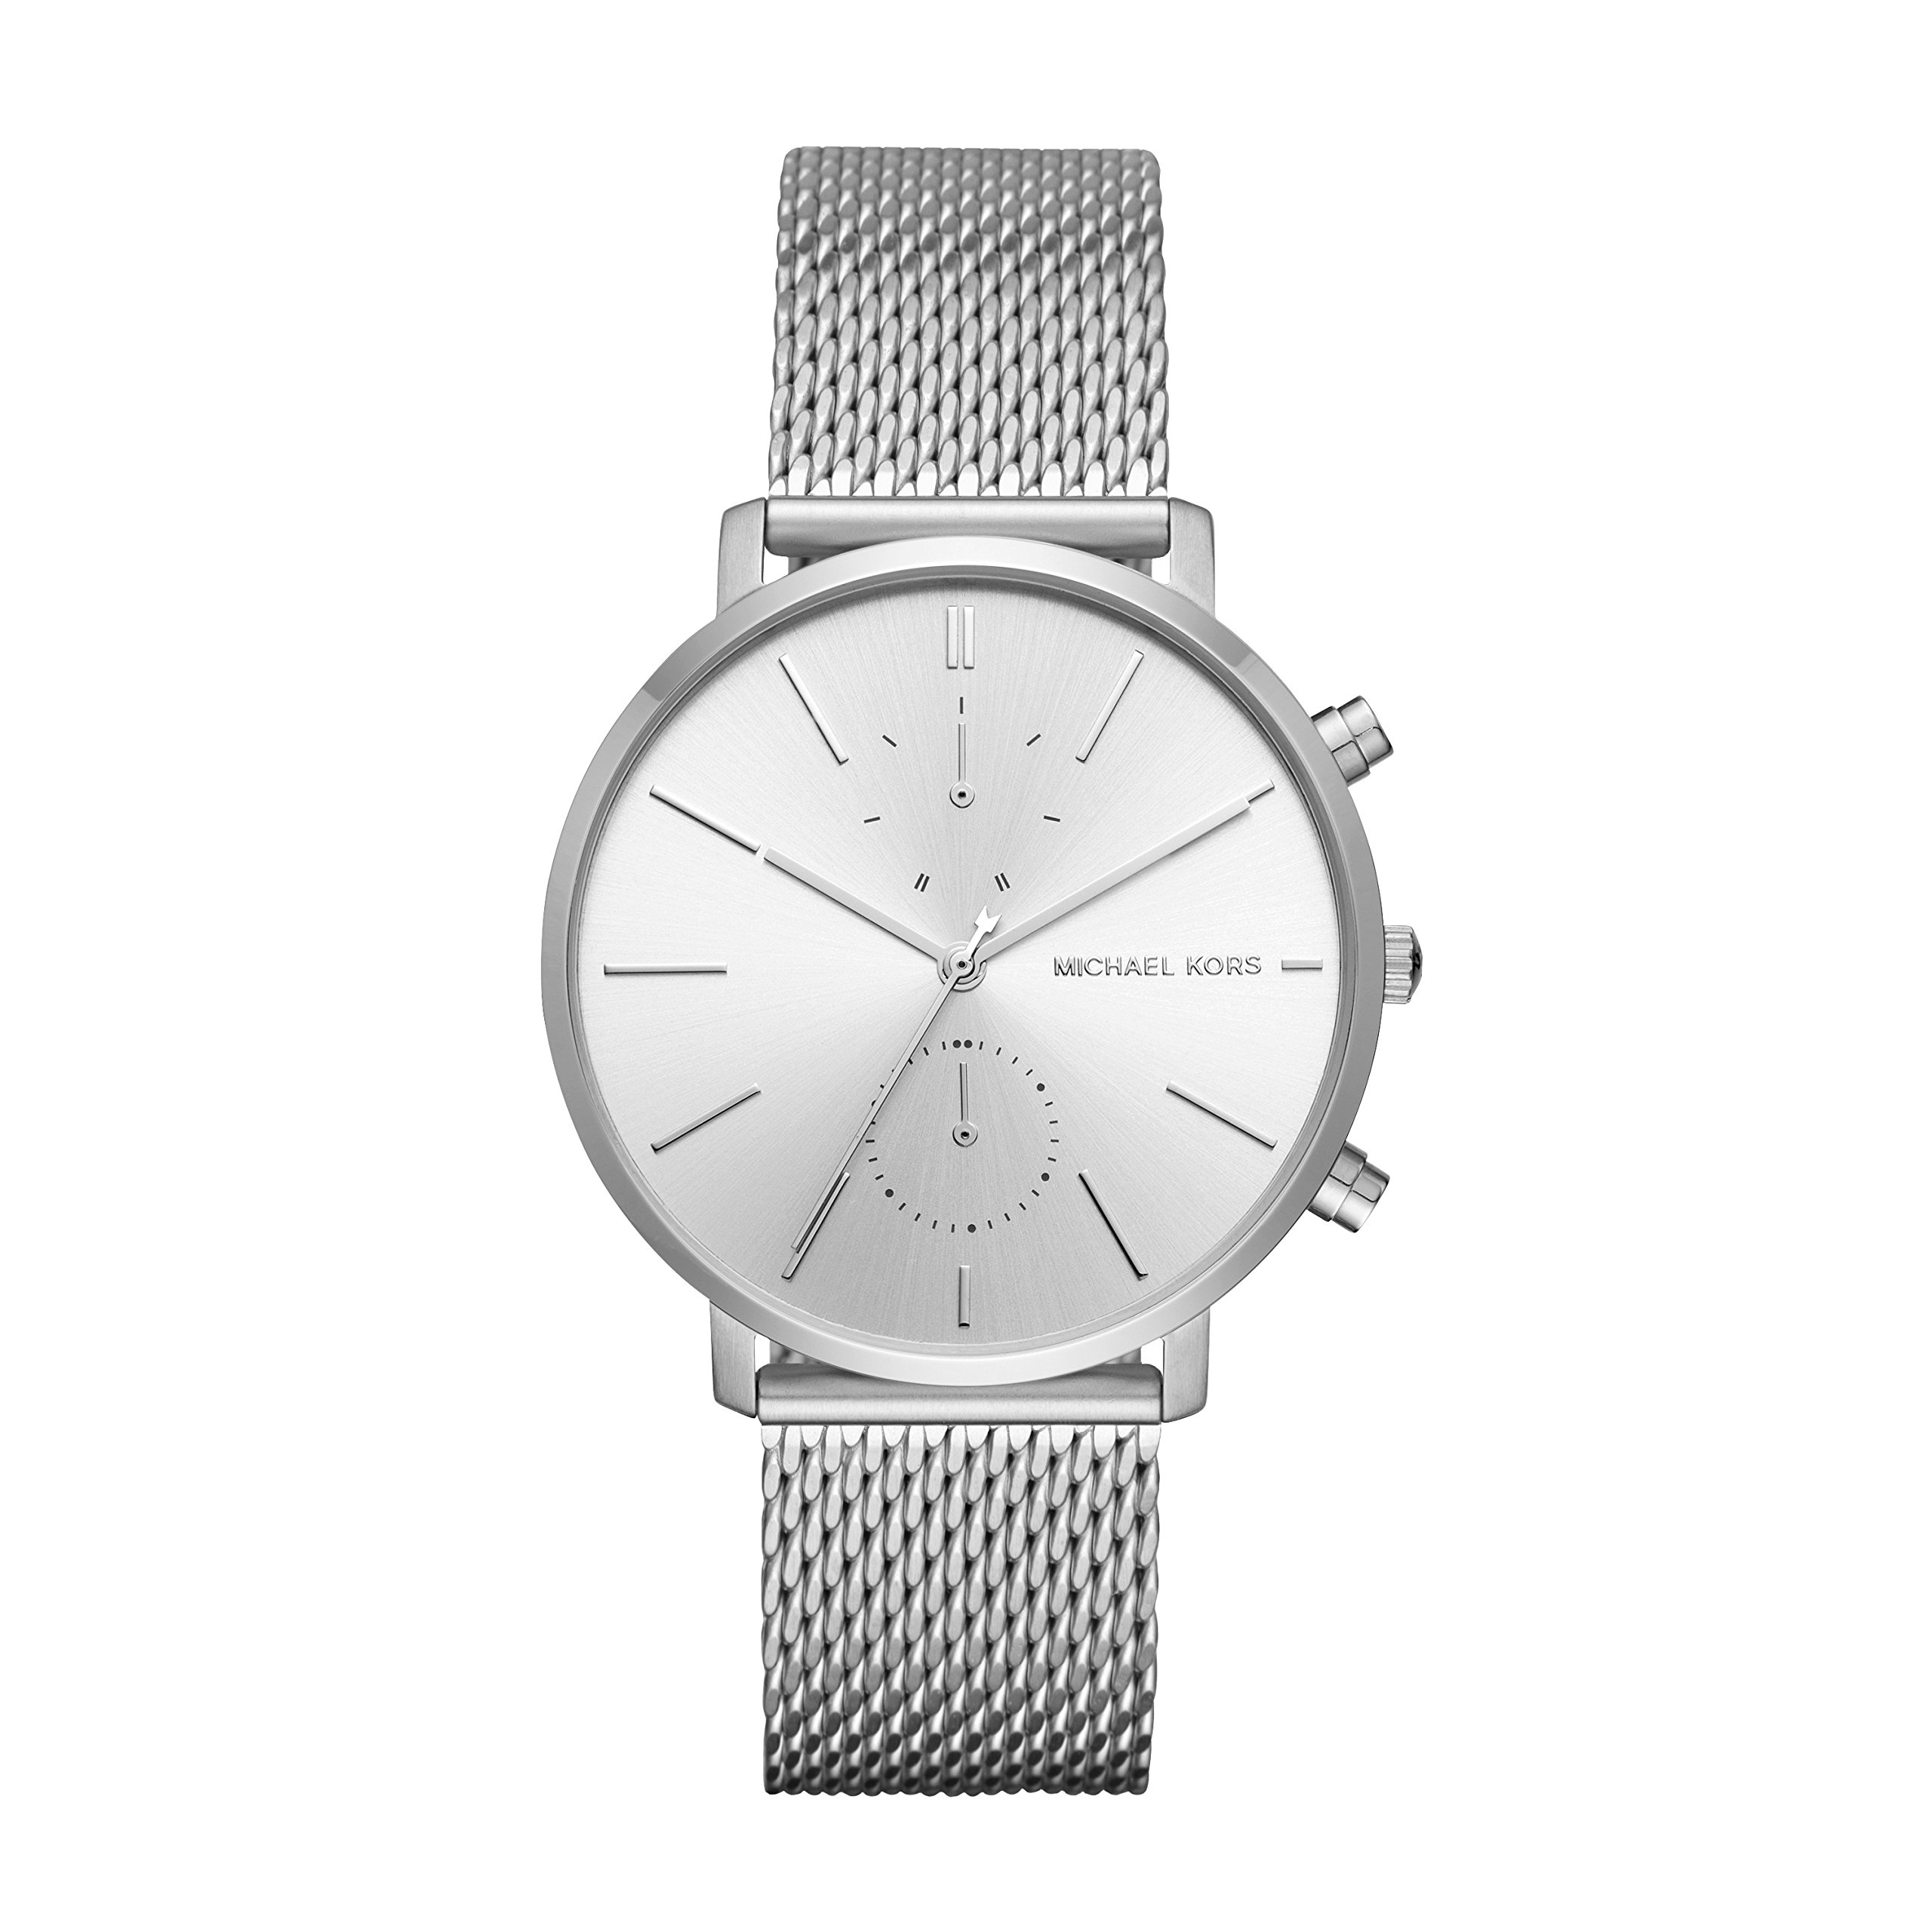 Michael Kors MK8541 Jaryn Silver Stainless Steel Mesh Strap Chronograph Men's Watch by Michael Kors